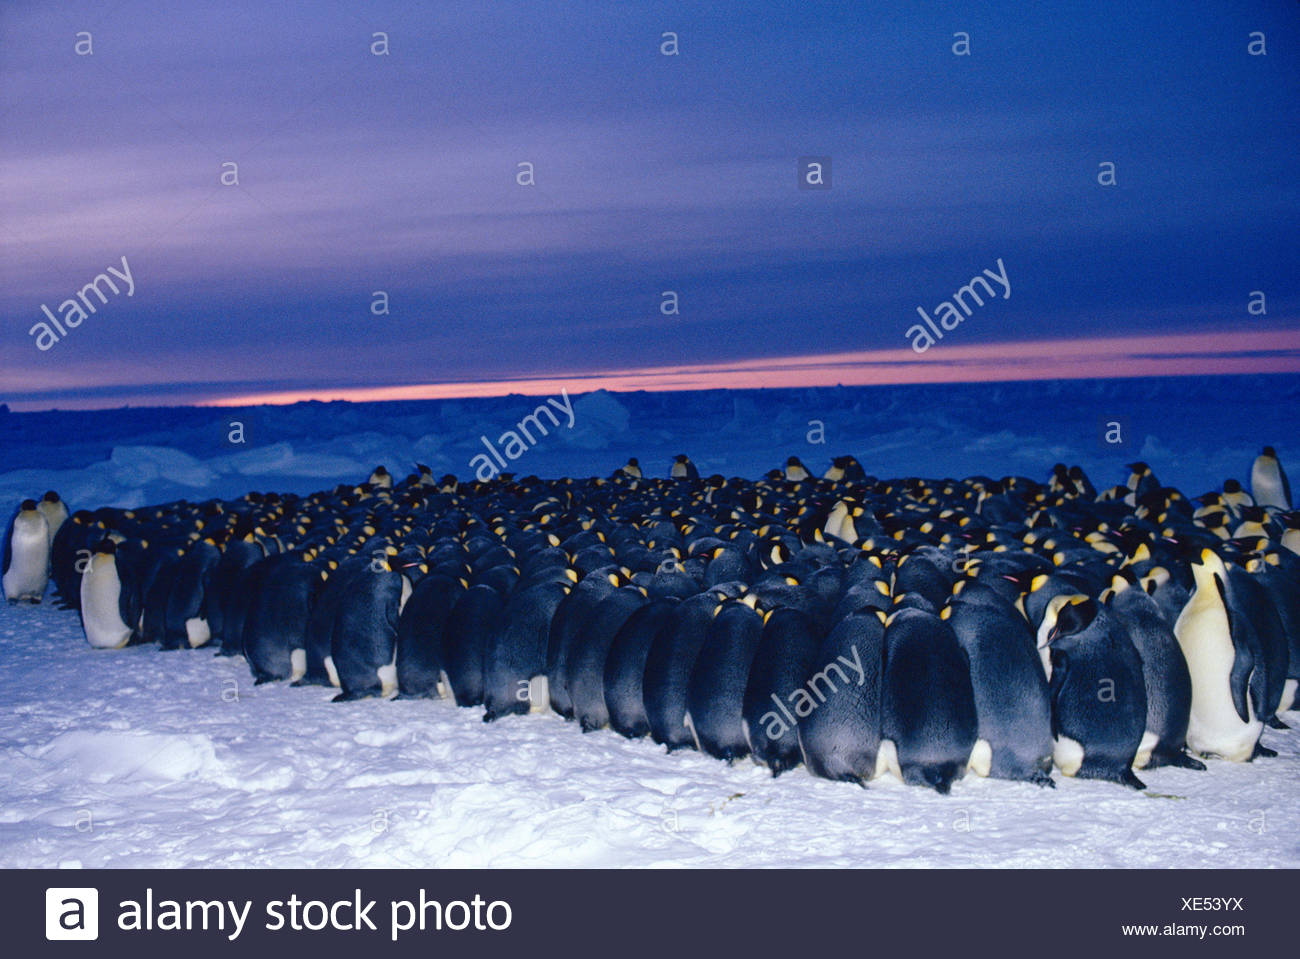 Emperor penguin {Aptenodytes forsteri} males huddle for warmth in minus 40 degrees centigrade while incubating eggs in winter, Antarctica Winter extreme cold survival birds seabirds nesting-behaviour - Stock Image